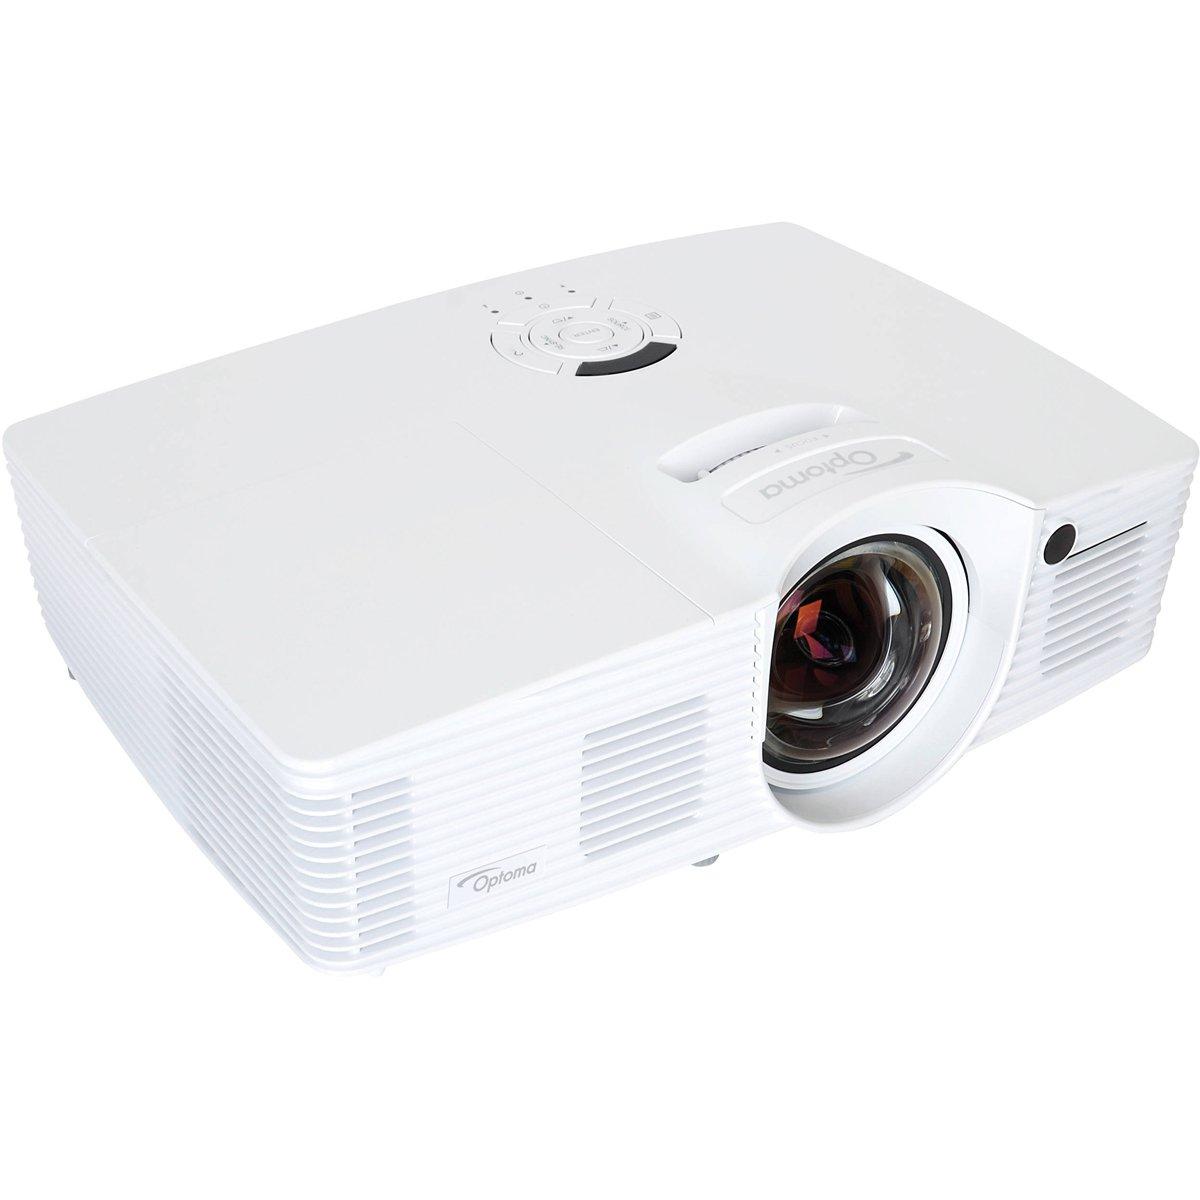 Optoma GT1080Darbee Lumens Gaming Projector Image 2